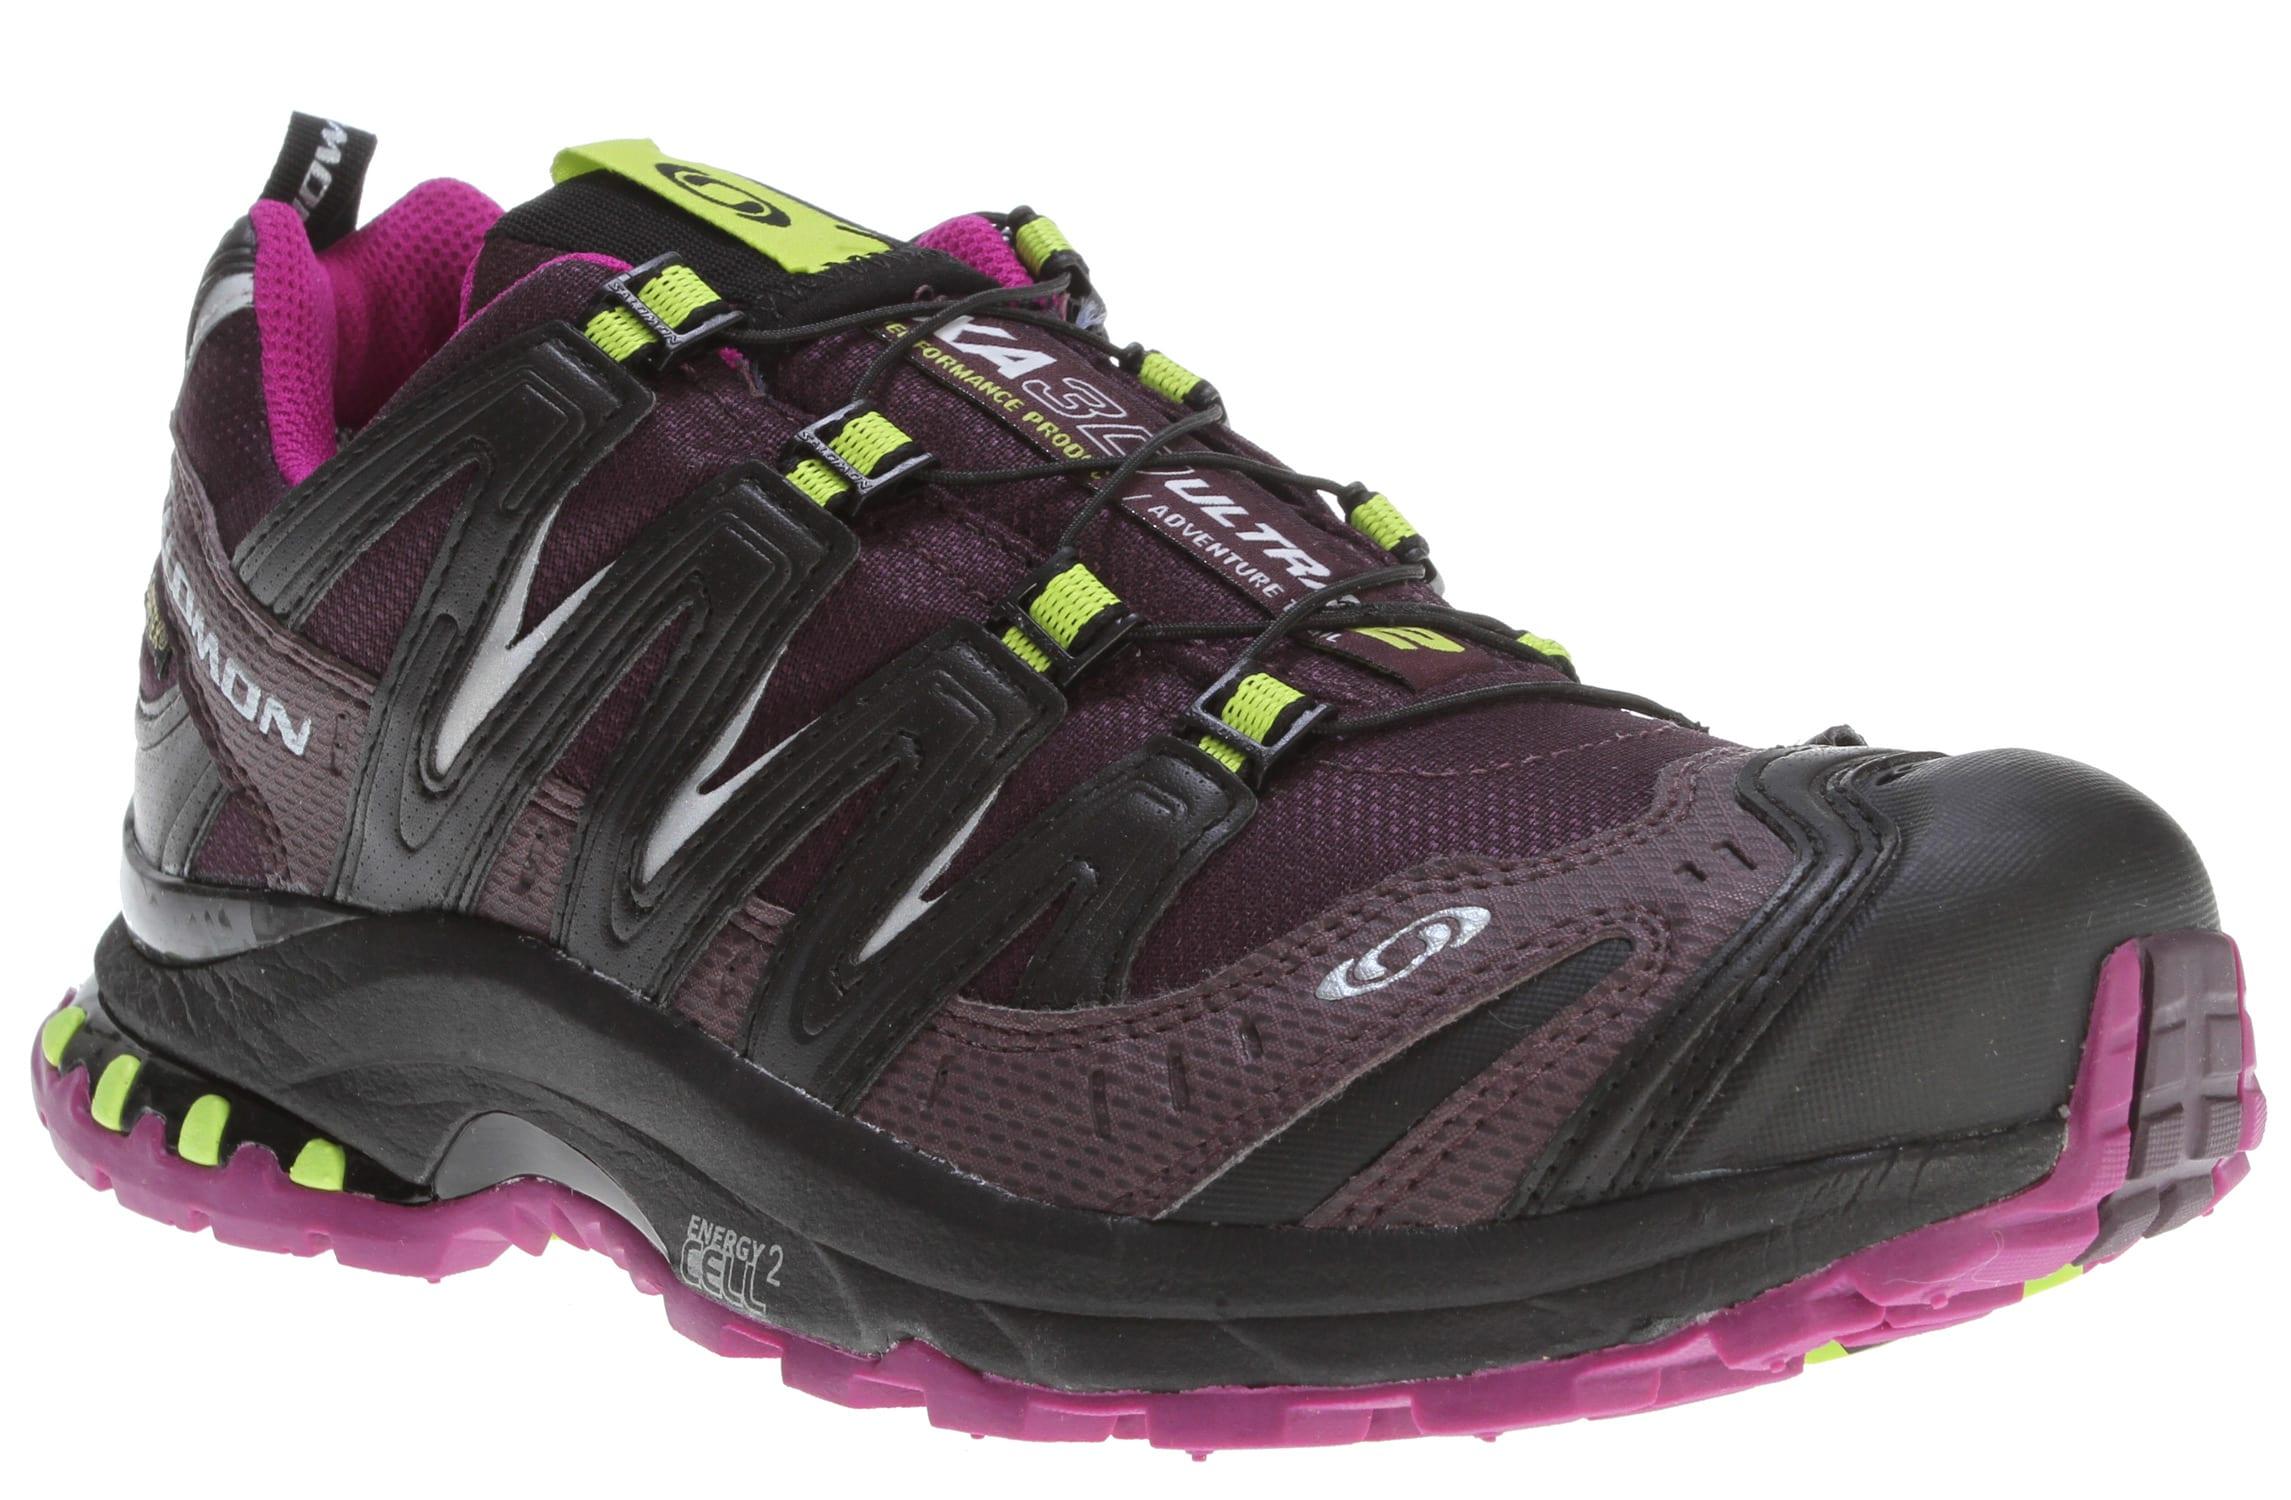 salomon xa pro 3d ultra 2 gtx trail running shoes womens. Black Bedroom Furniture Sets. Home Design Ideas